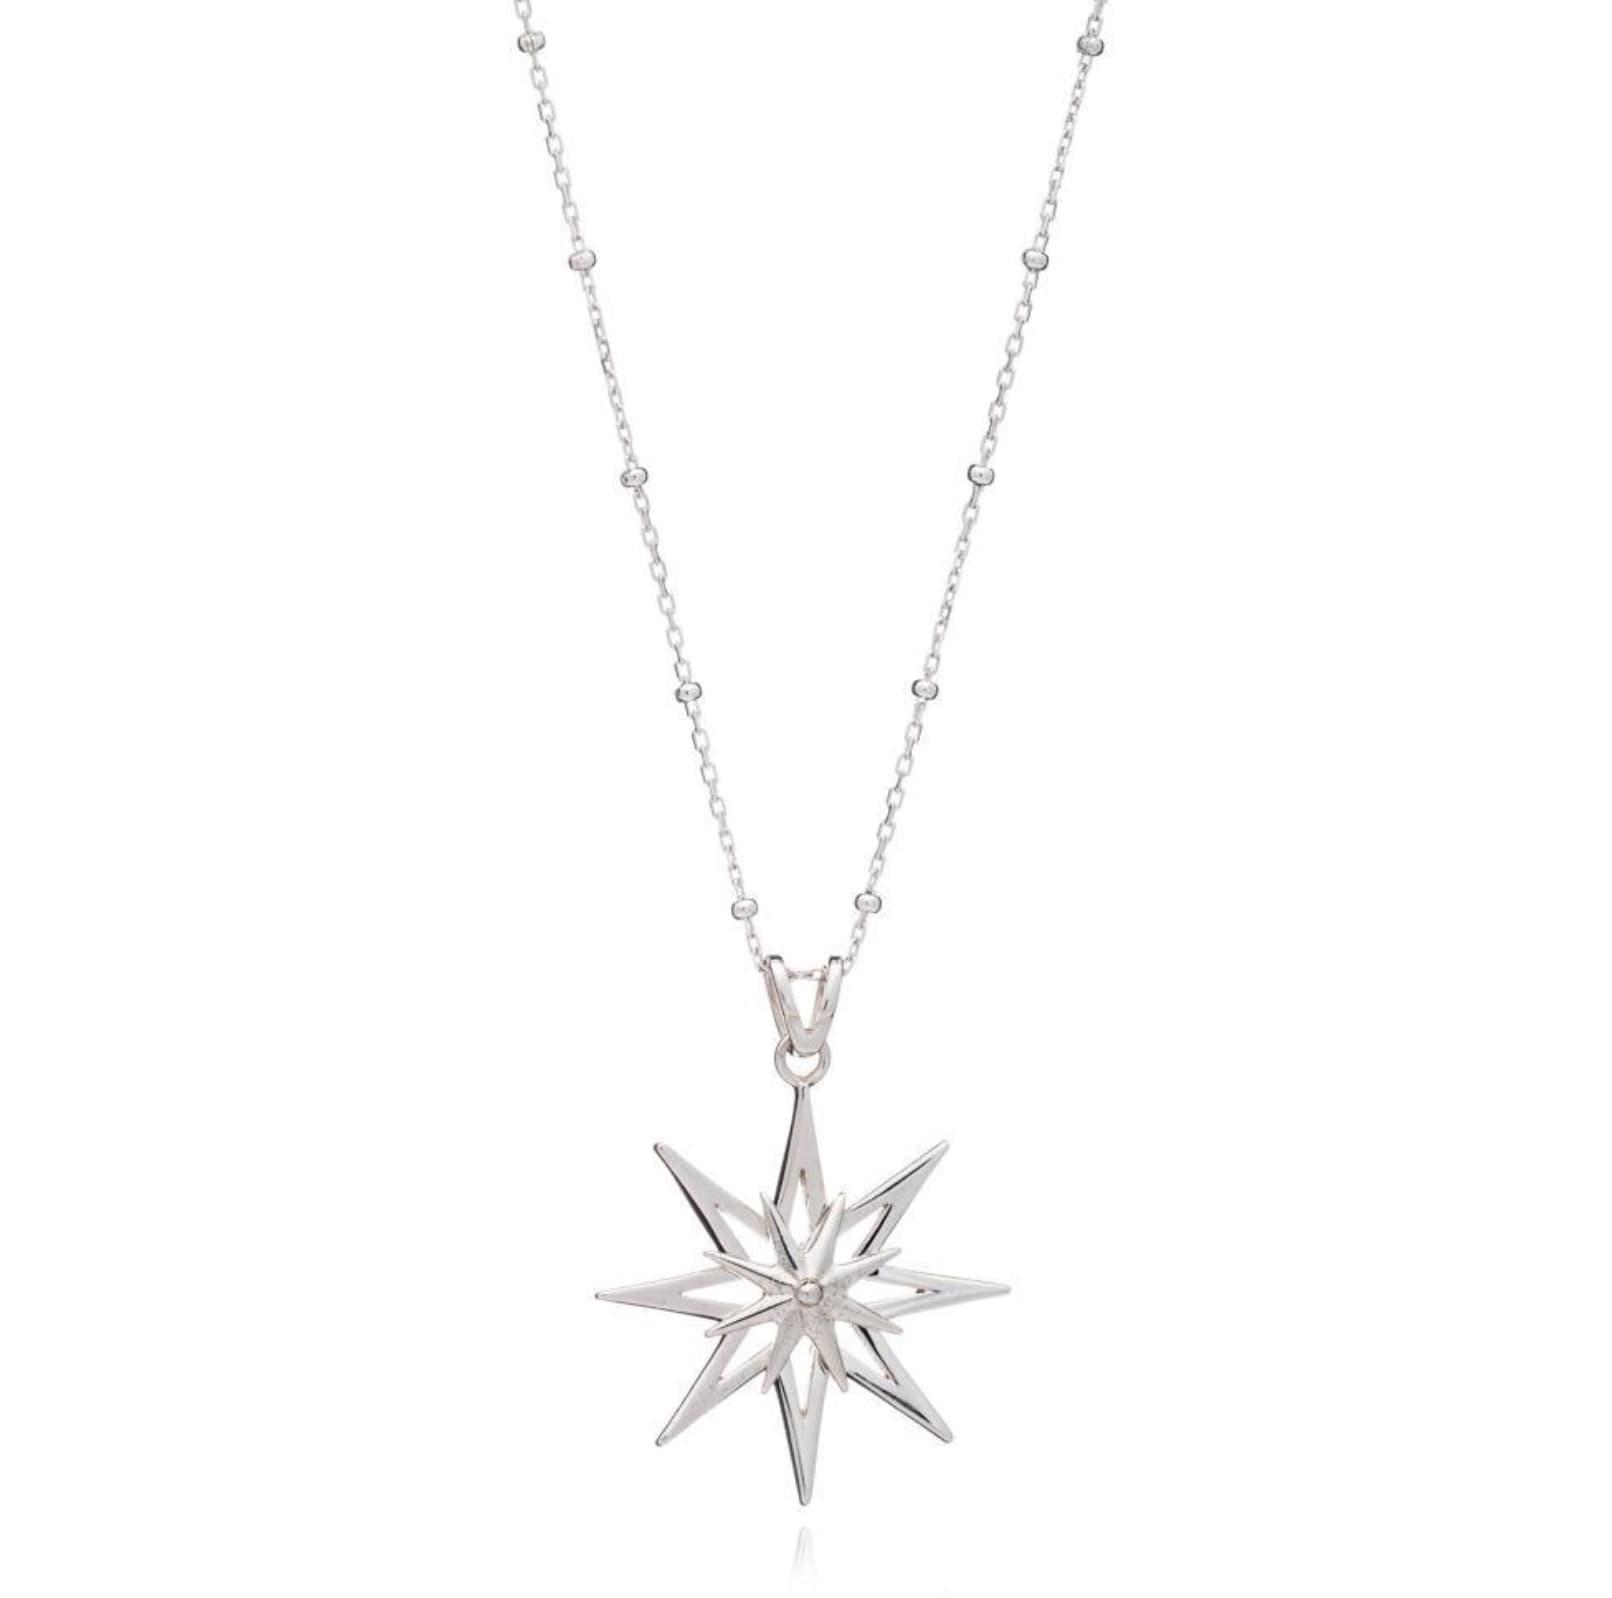 Rachel Jackson Rock Star Necklace silver